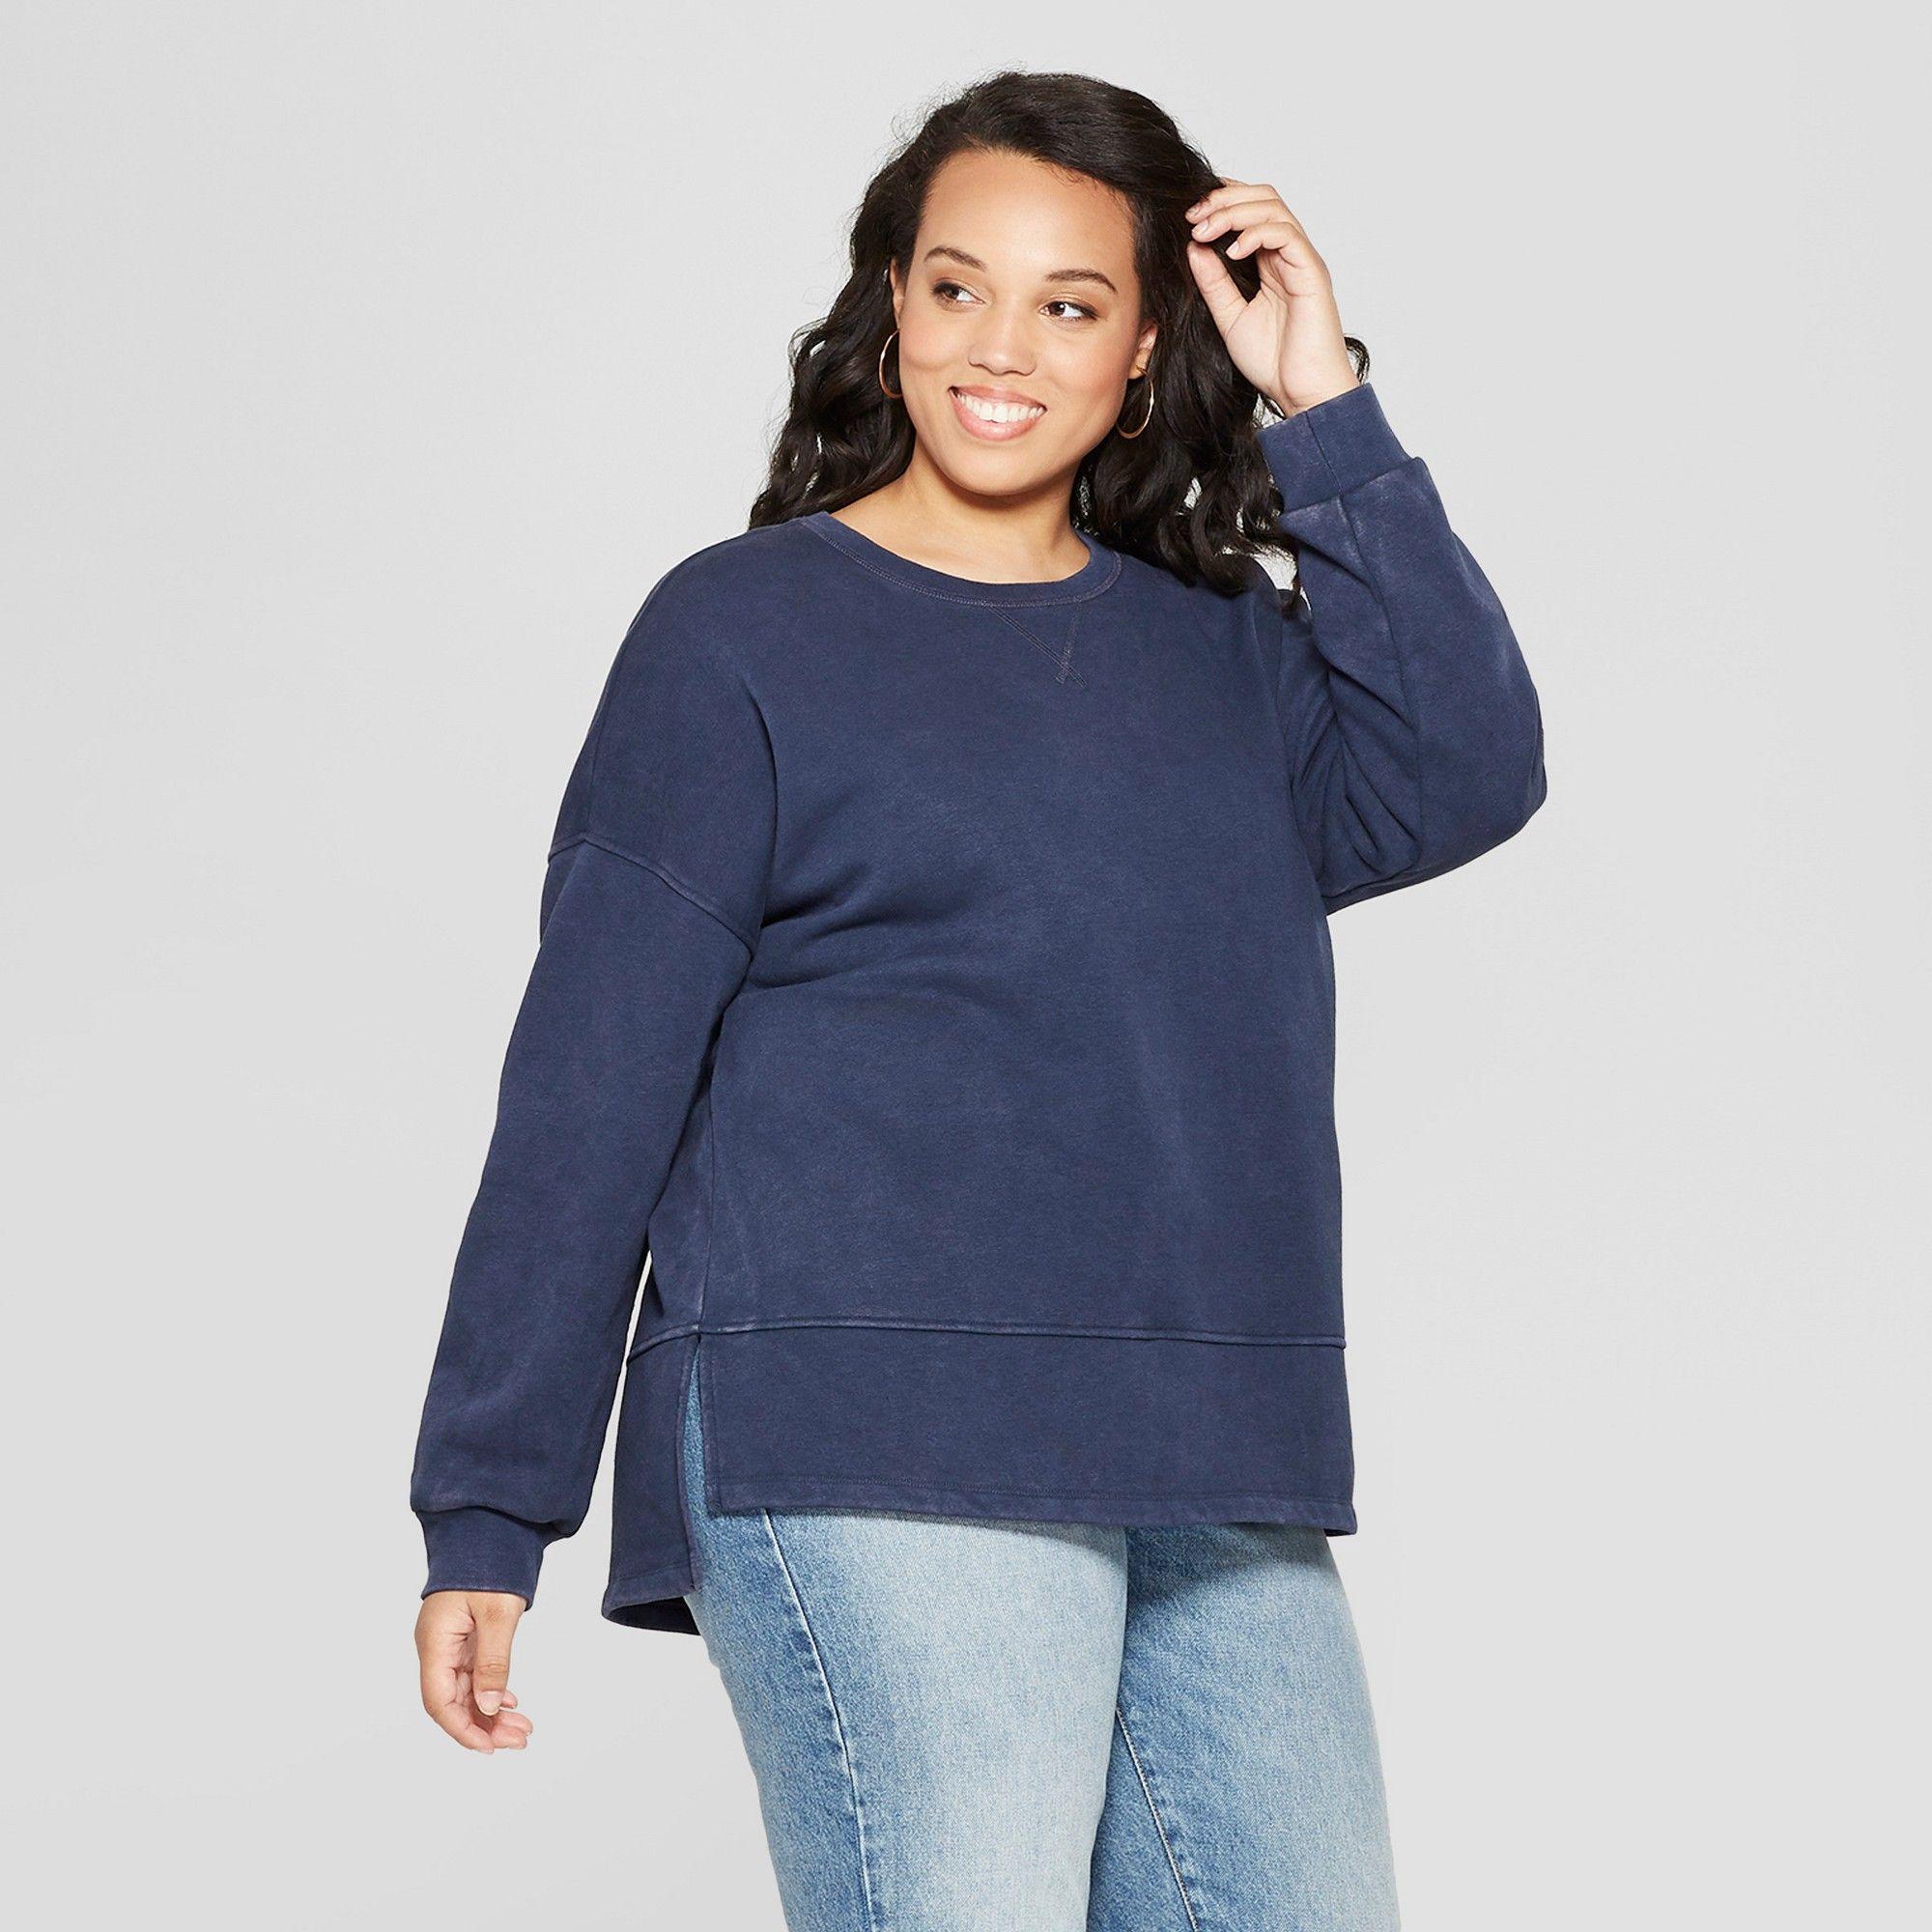 6bcfbd593e8 Women s Plus Size Tunic Long Sleeve Sweatshirt - Universal Thread Navy  (Blue) 1X